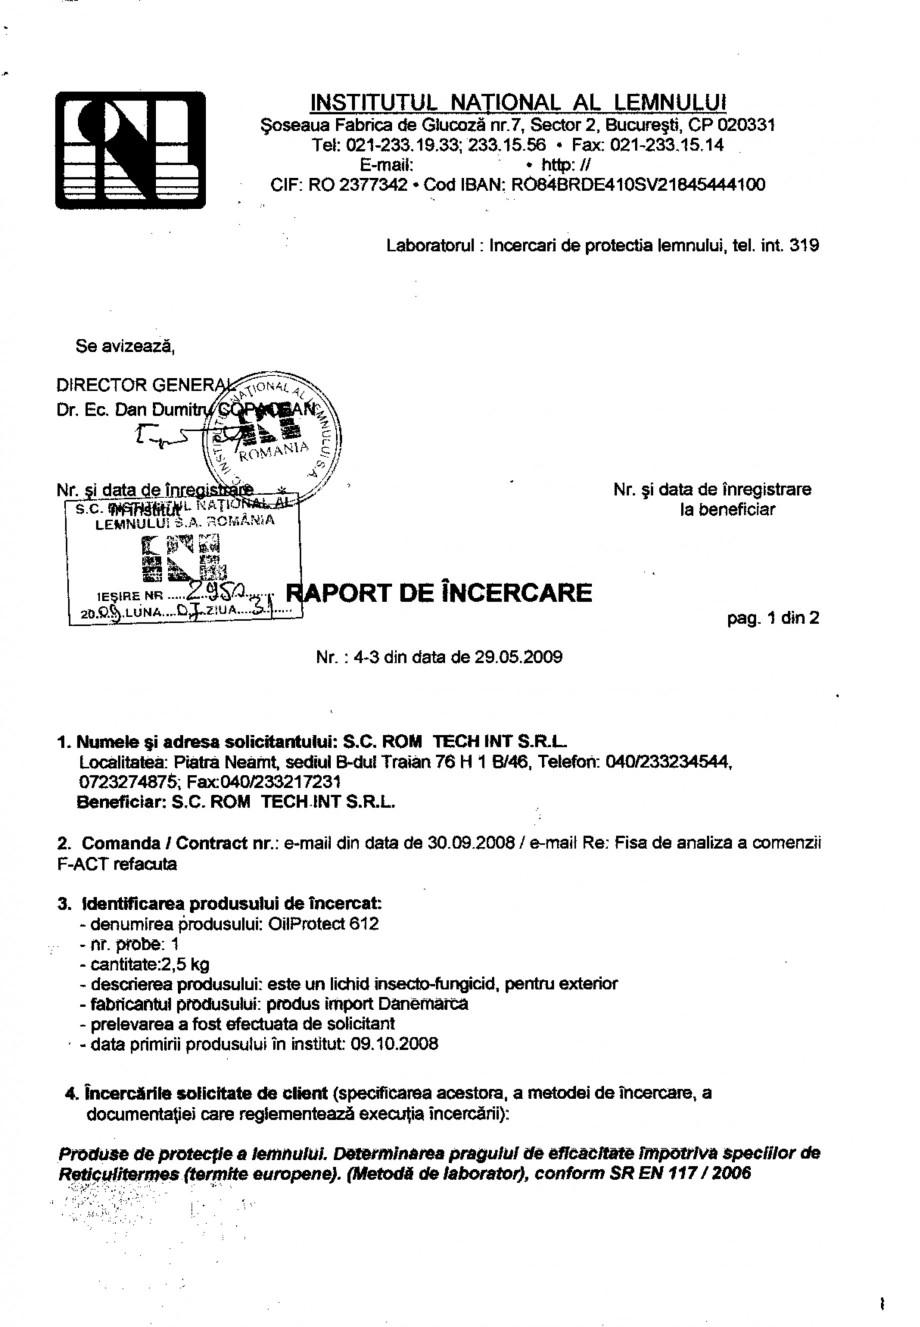 Pagina 1 - Tratament pentru lemn - Raport incercare anti-termite conform SR EN 117-2006 Nordcoll -...